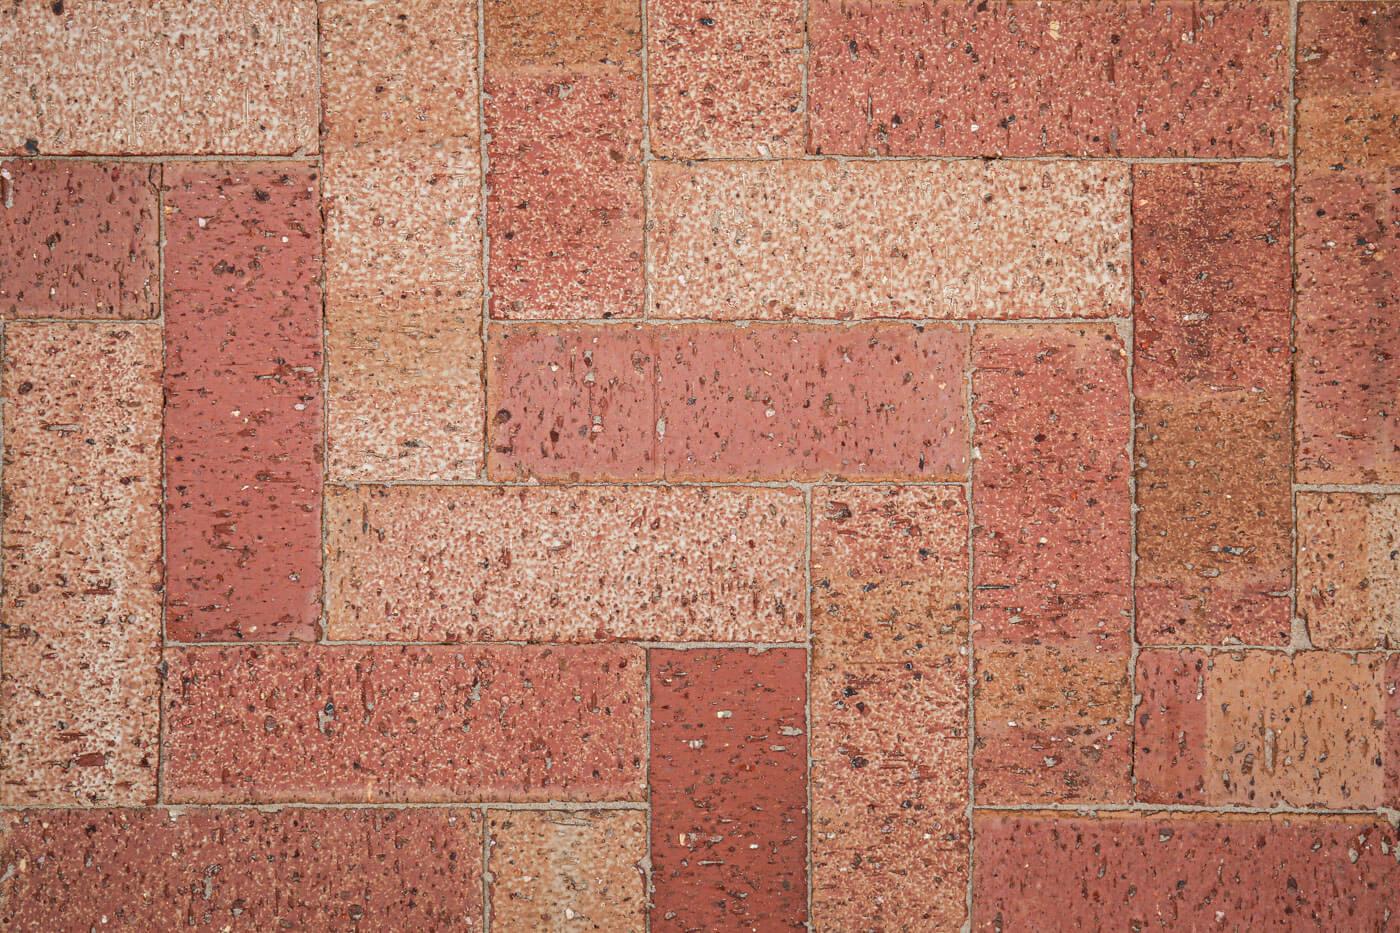 Stardust Rouge Paver 230mm X 76mm X 62mm Herringbone Pattern Littlehampton Bricks And Pavers Rs W 1